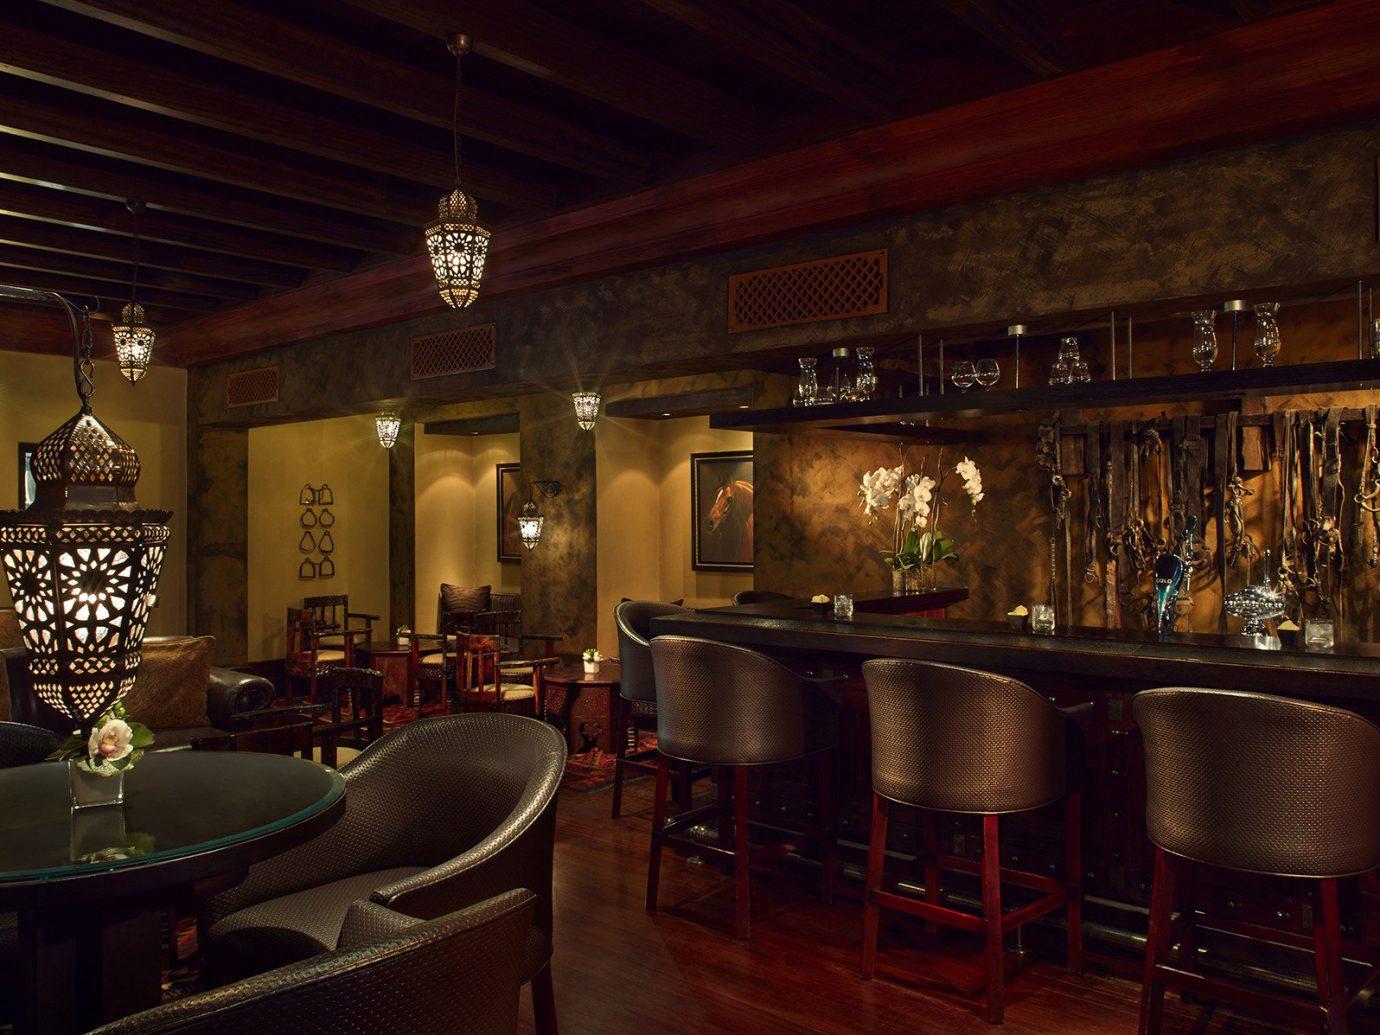 Dubai Hotels Luxury Travel Middle East indoor table ceiling floor chair room Bar restaurant interior design tavern pub café furniture several dining room